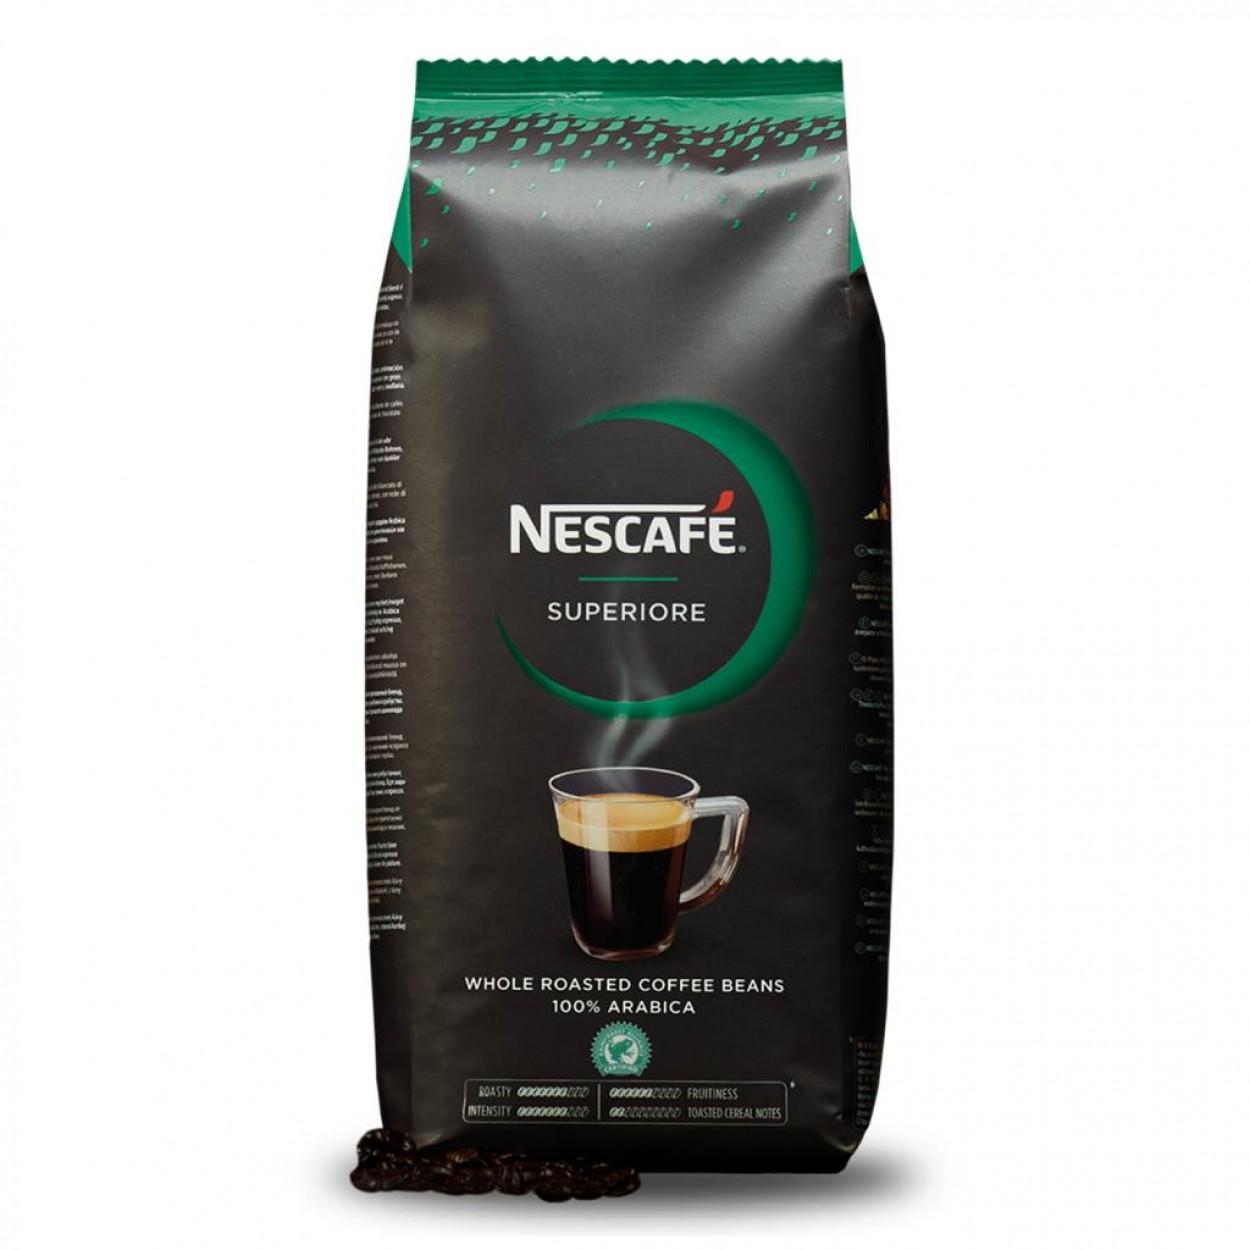 Nescafe Superiore Çekirdek Kahve 1 kg